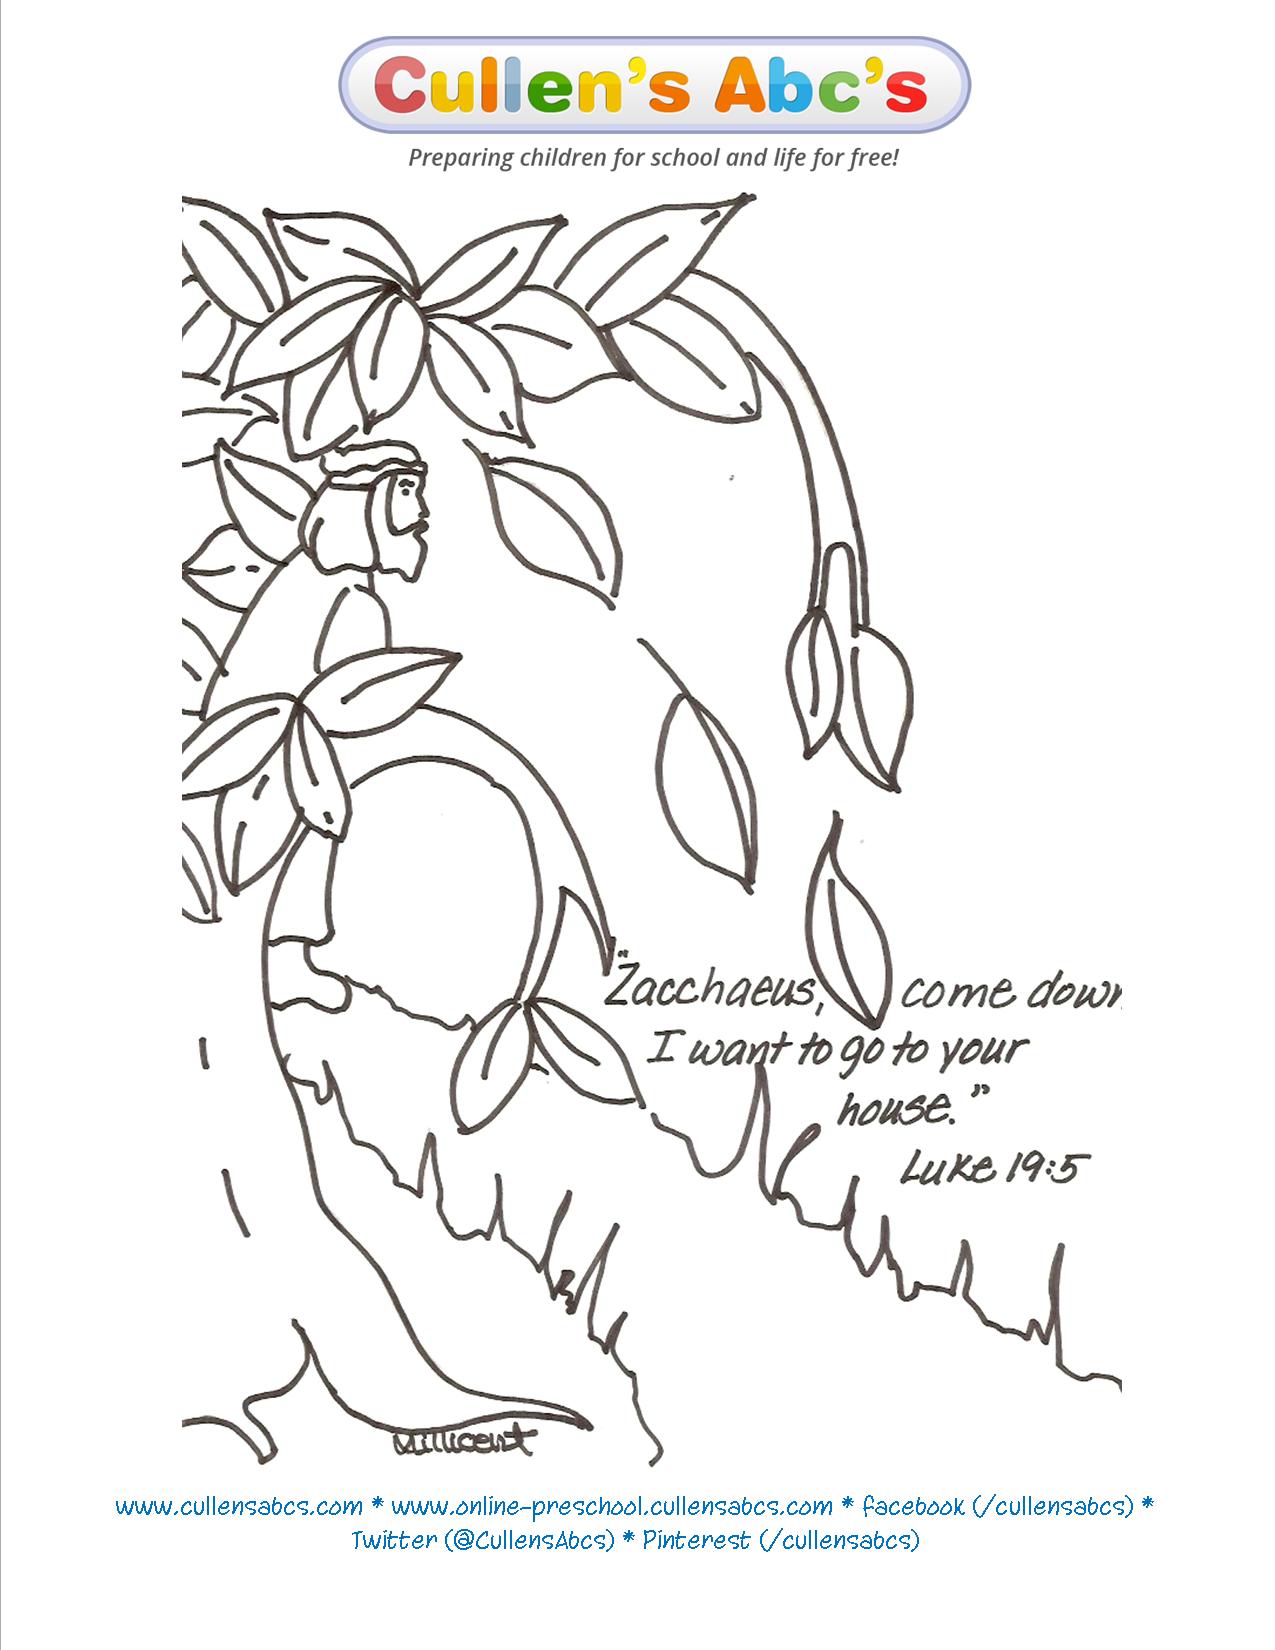 Zaccheus Bible Memory Verse Coloring Sheet Http Cullensabcs Com Wp Content Uploads 2010 04 Bible Coloring Pages Bible Verse Coloring Page Bible Coloring [ 1650 x 1275 Pixel ]